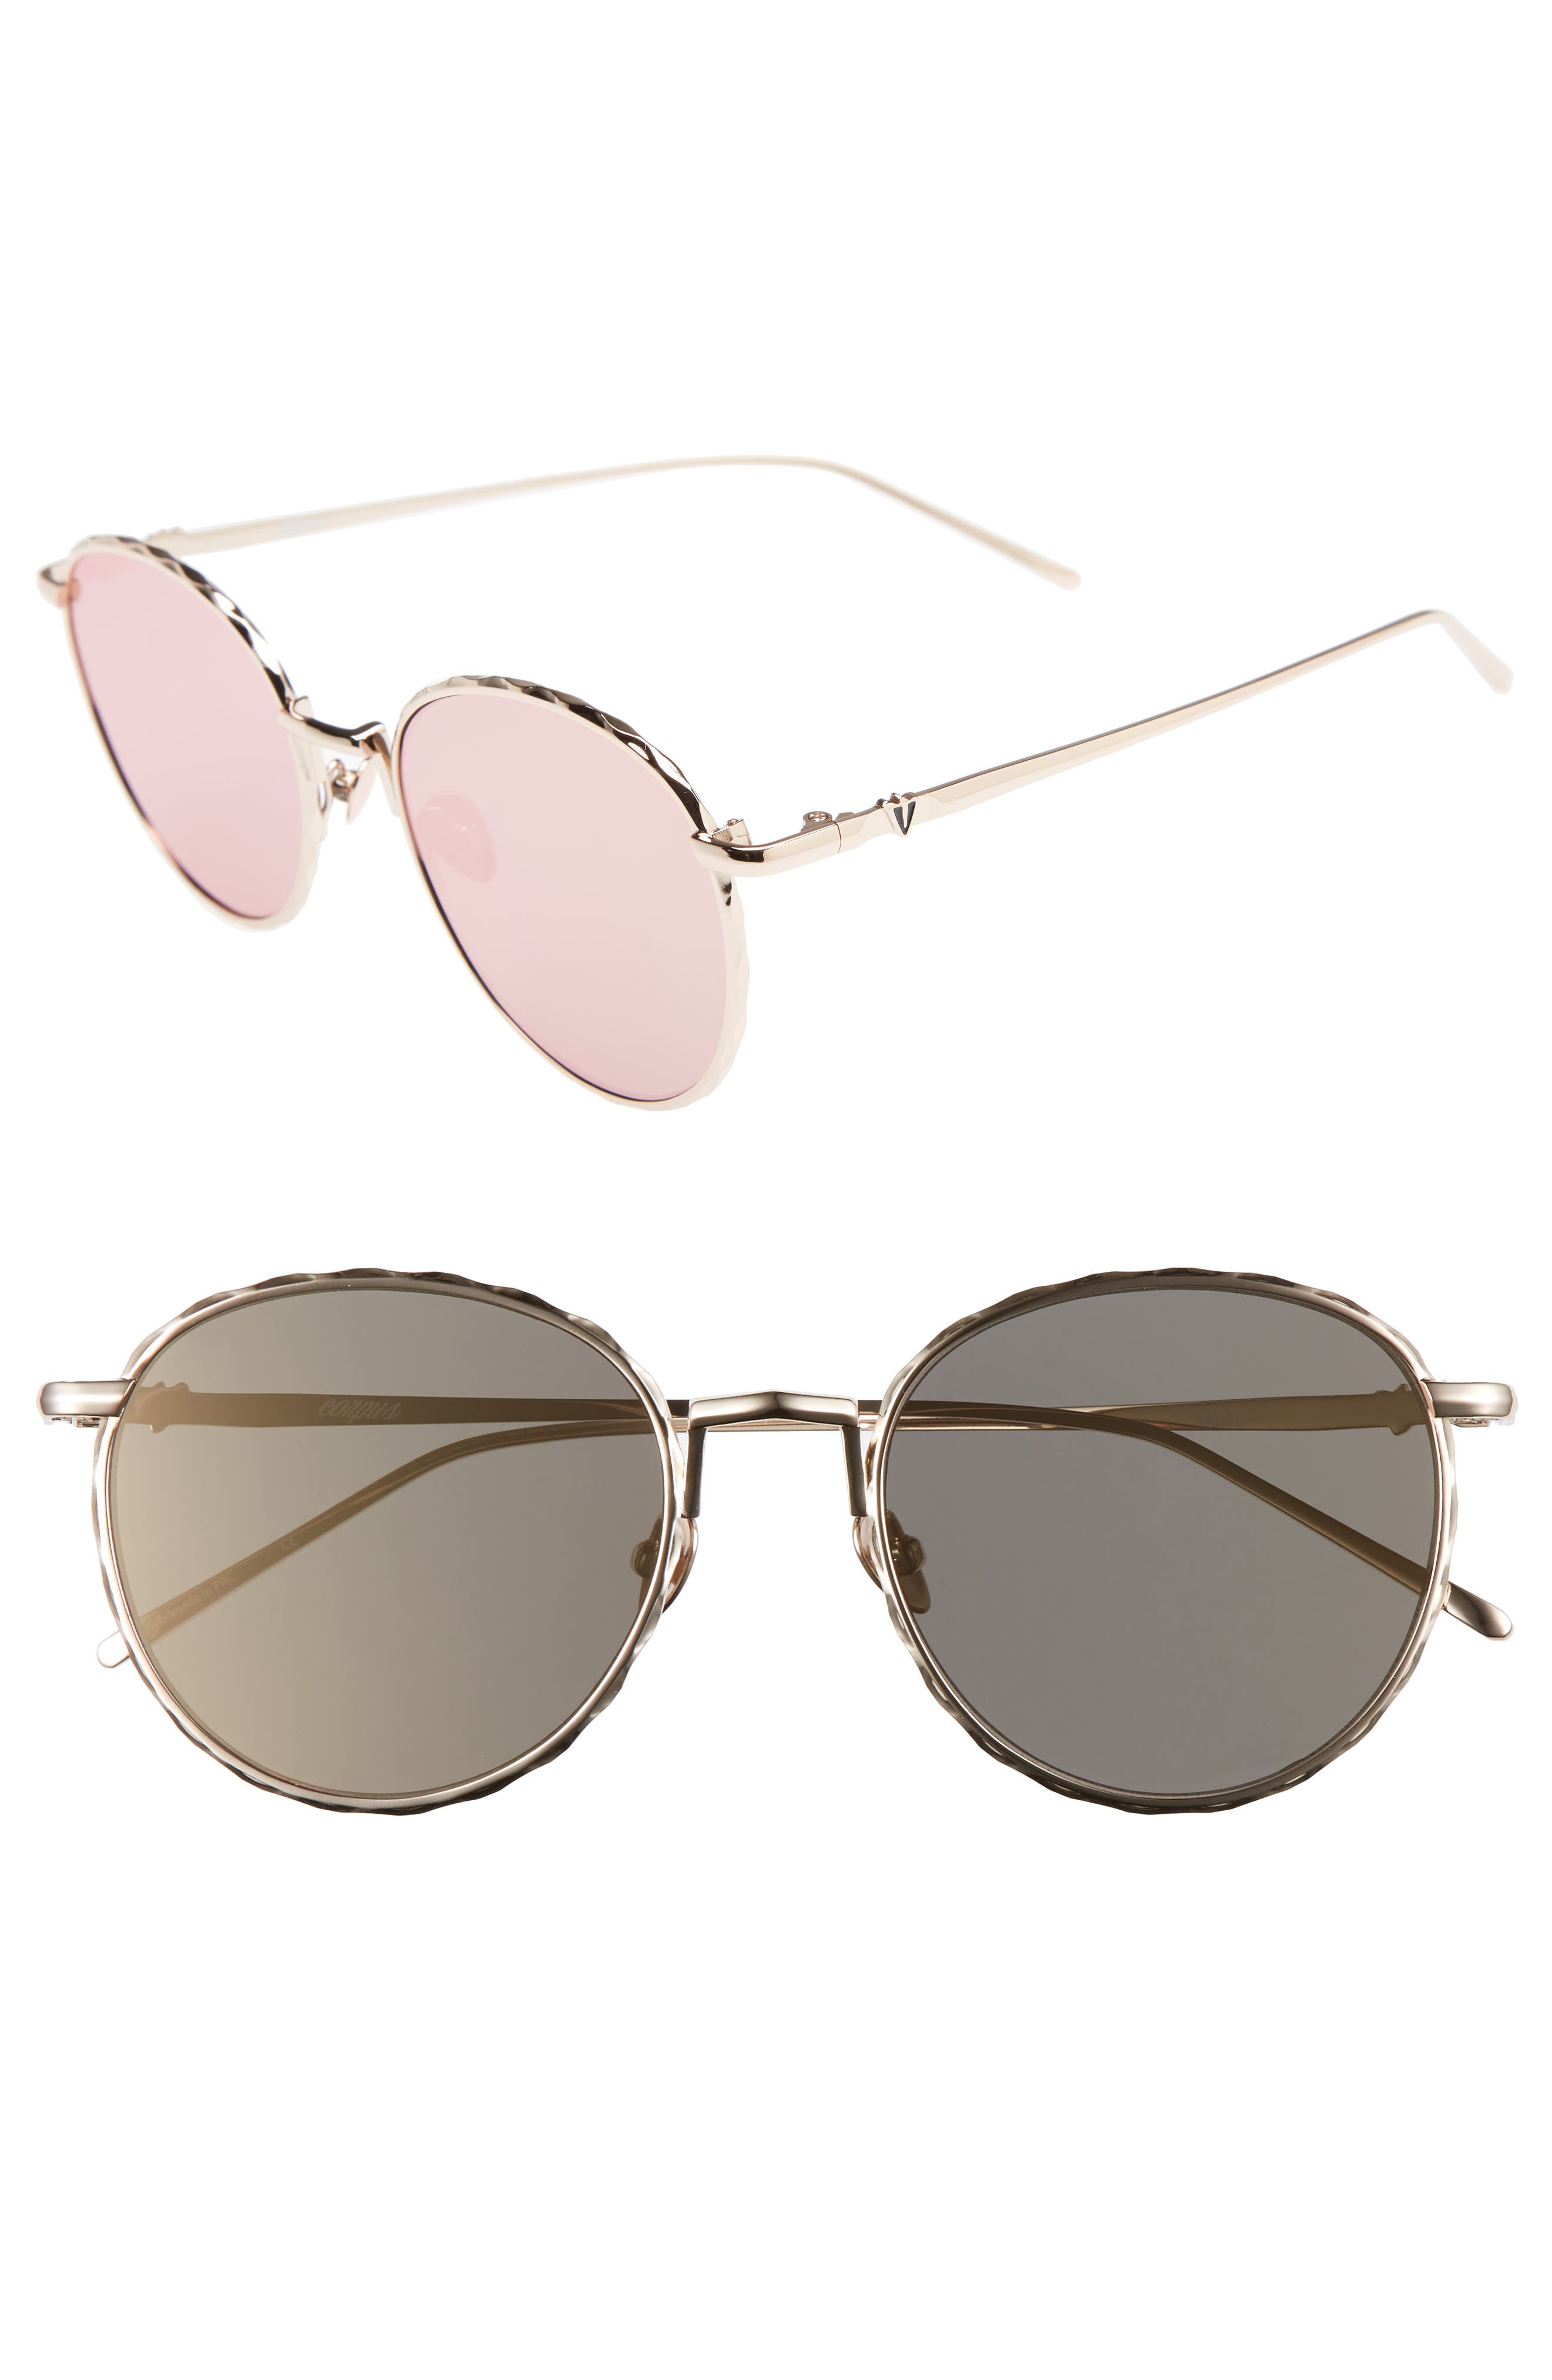 Corpus 53mm Round Sunglasses,                         Main,                         color, Rose Gold/ Rose Gold Mirror